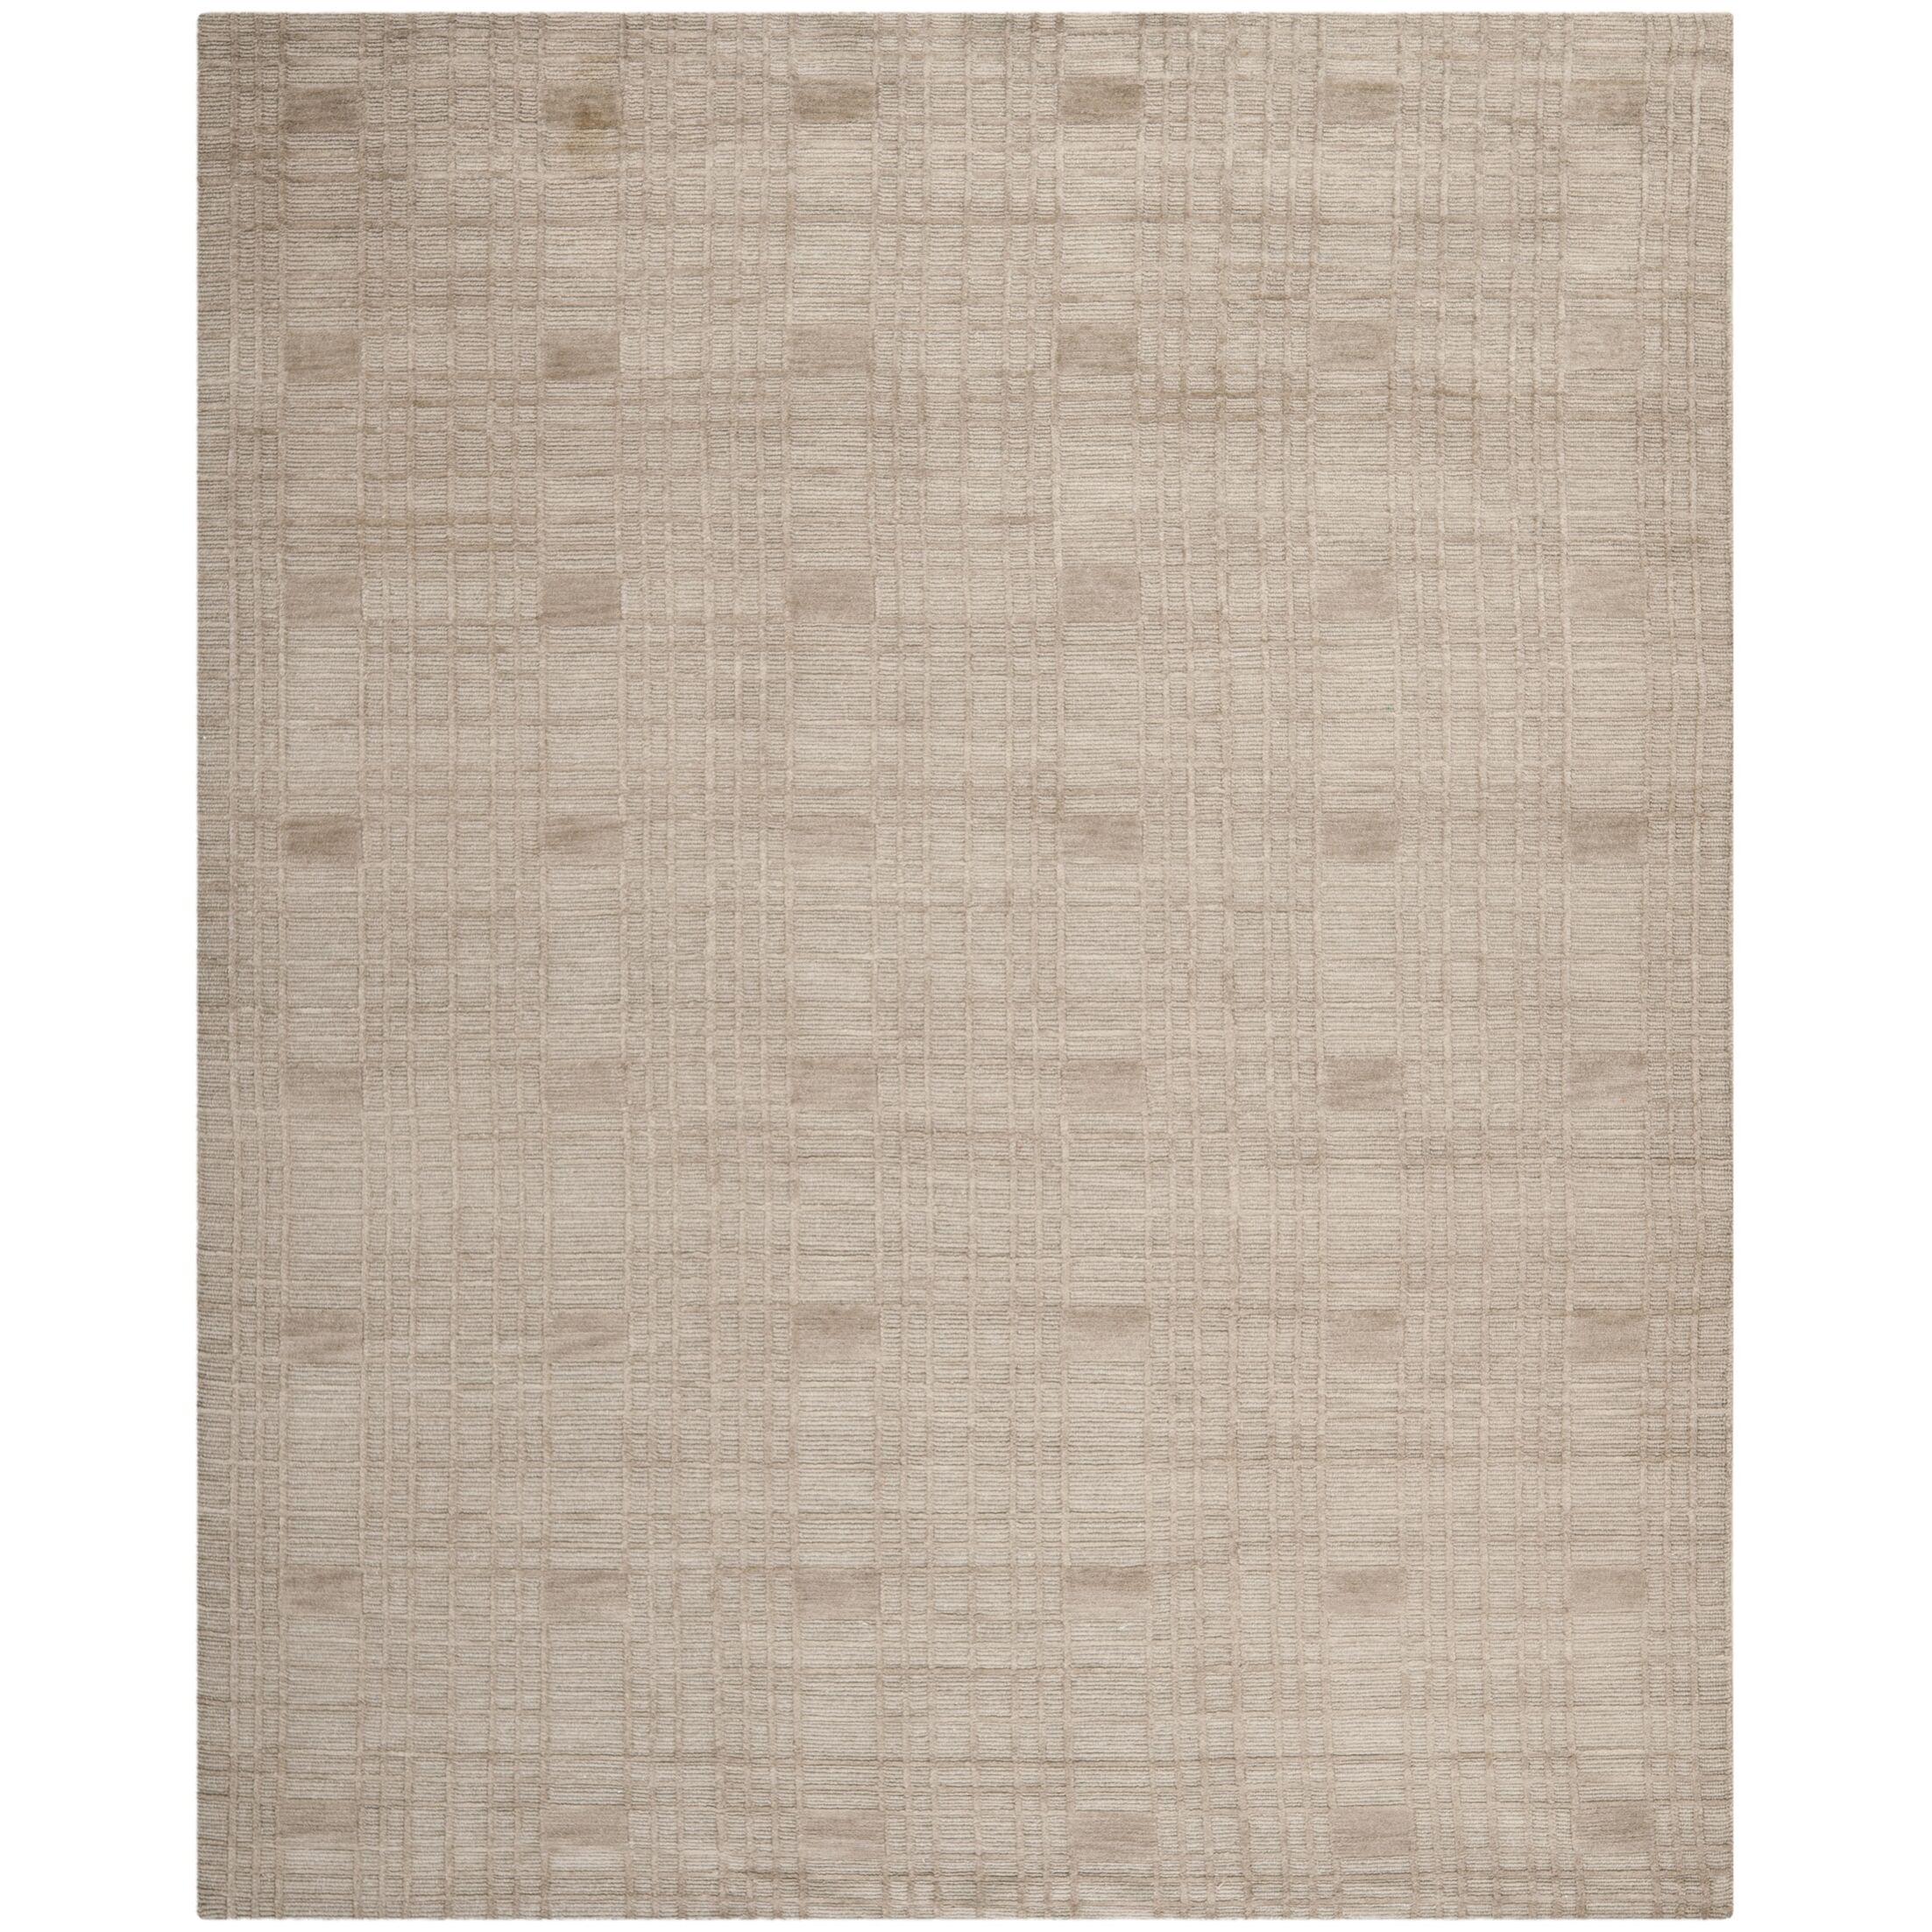 Slate Area Rug Rug Size: Rectangle 10' x 14'